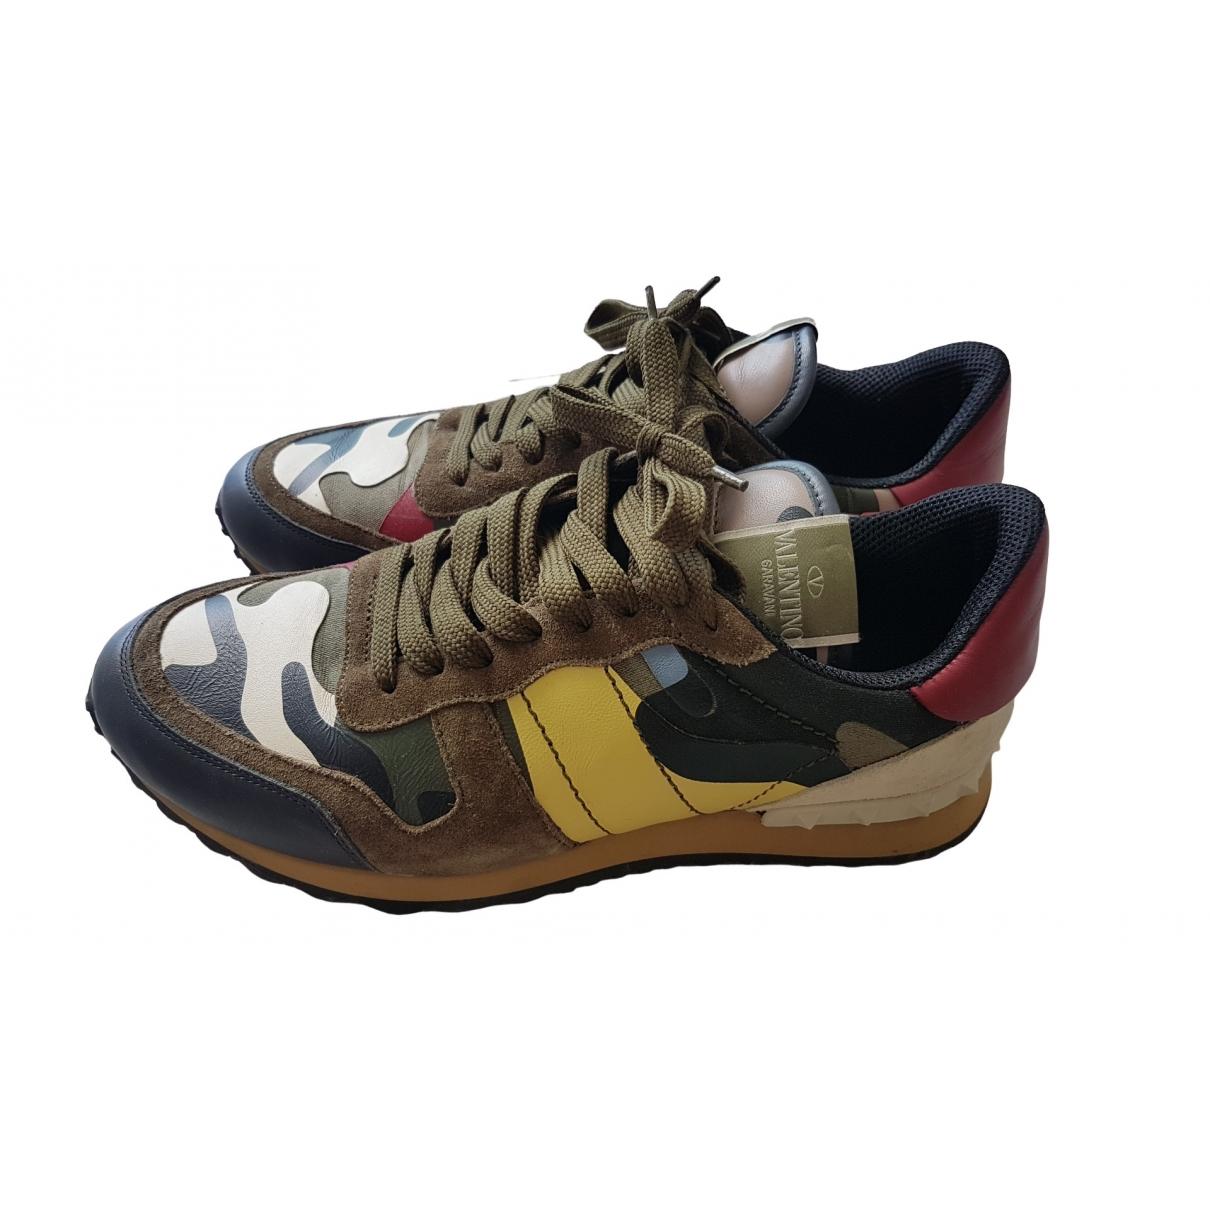 Valentino Garavani Rockrunner Multicolour Leather Trainers for Men 41 IT